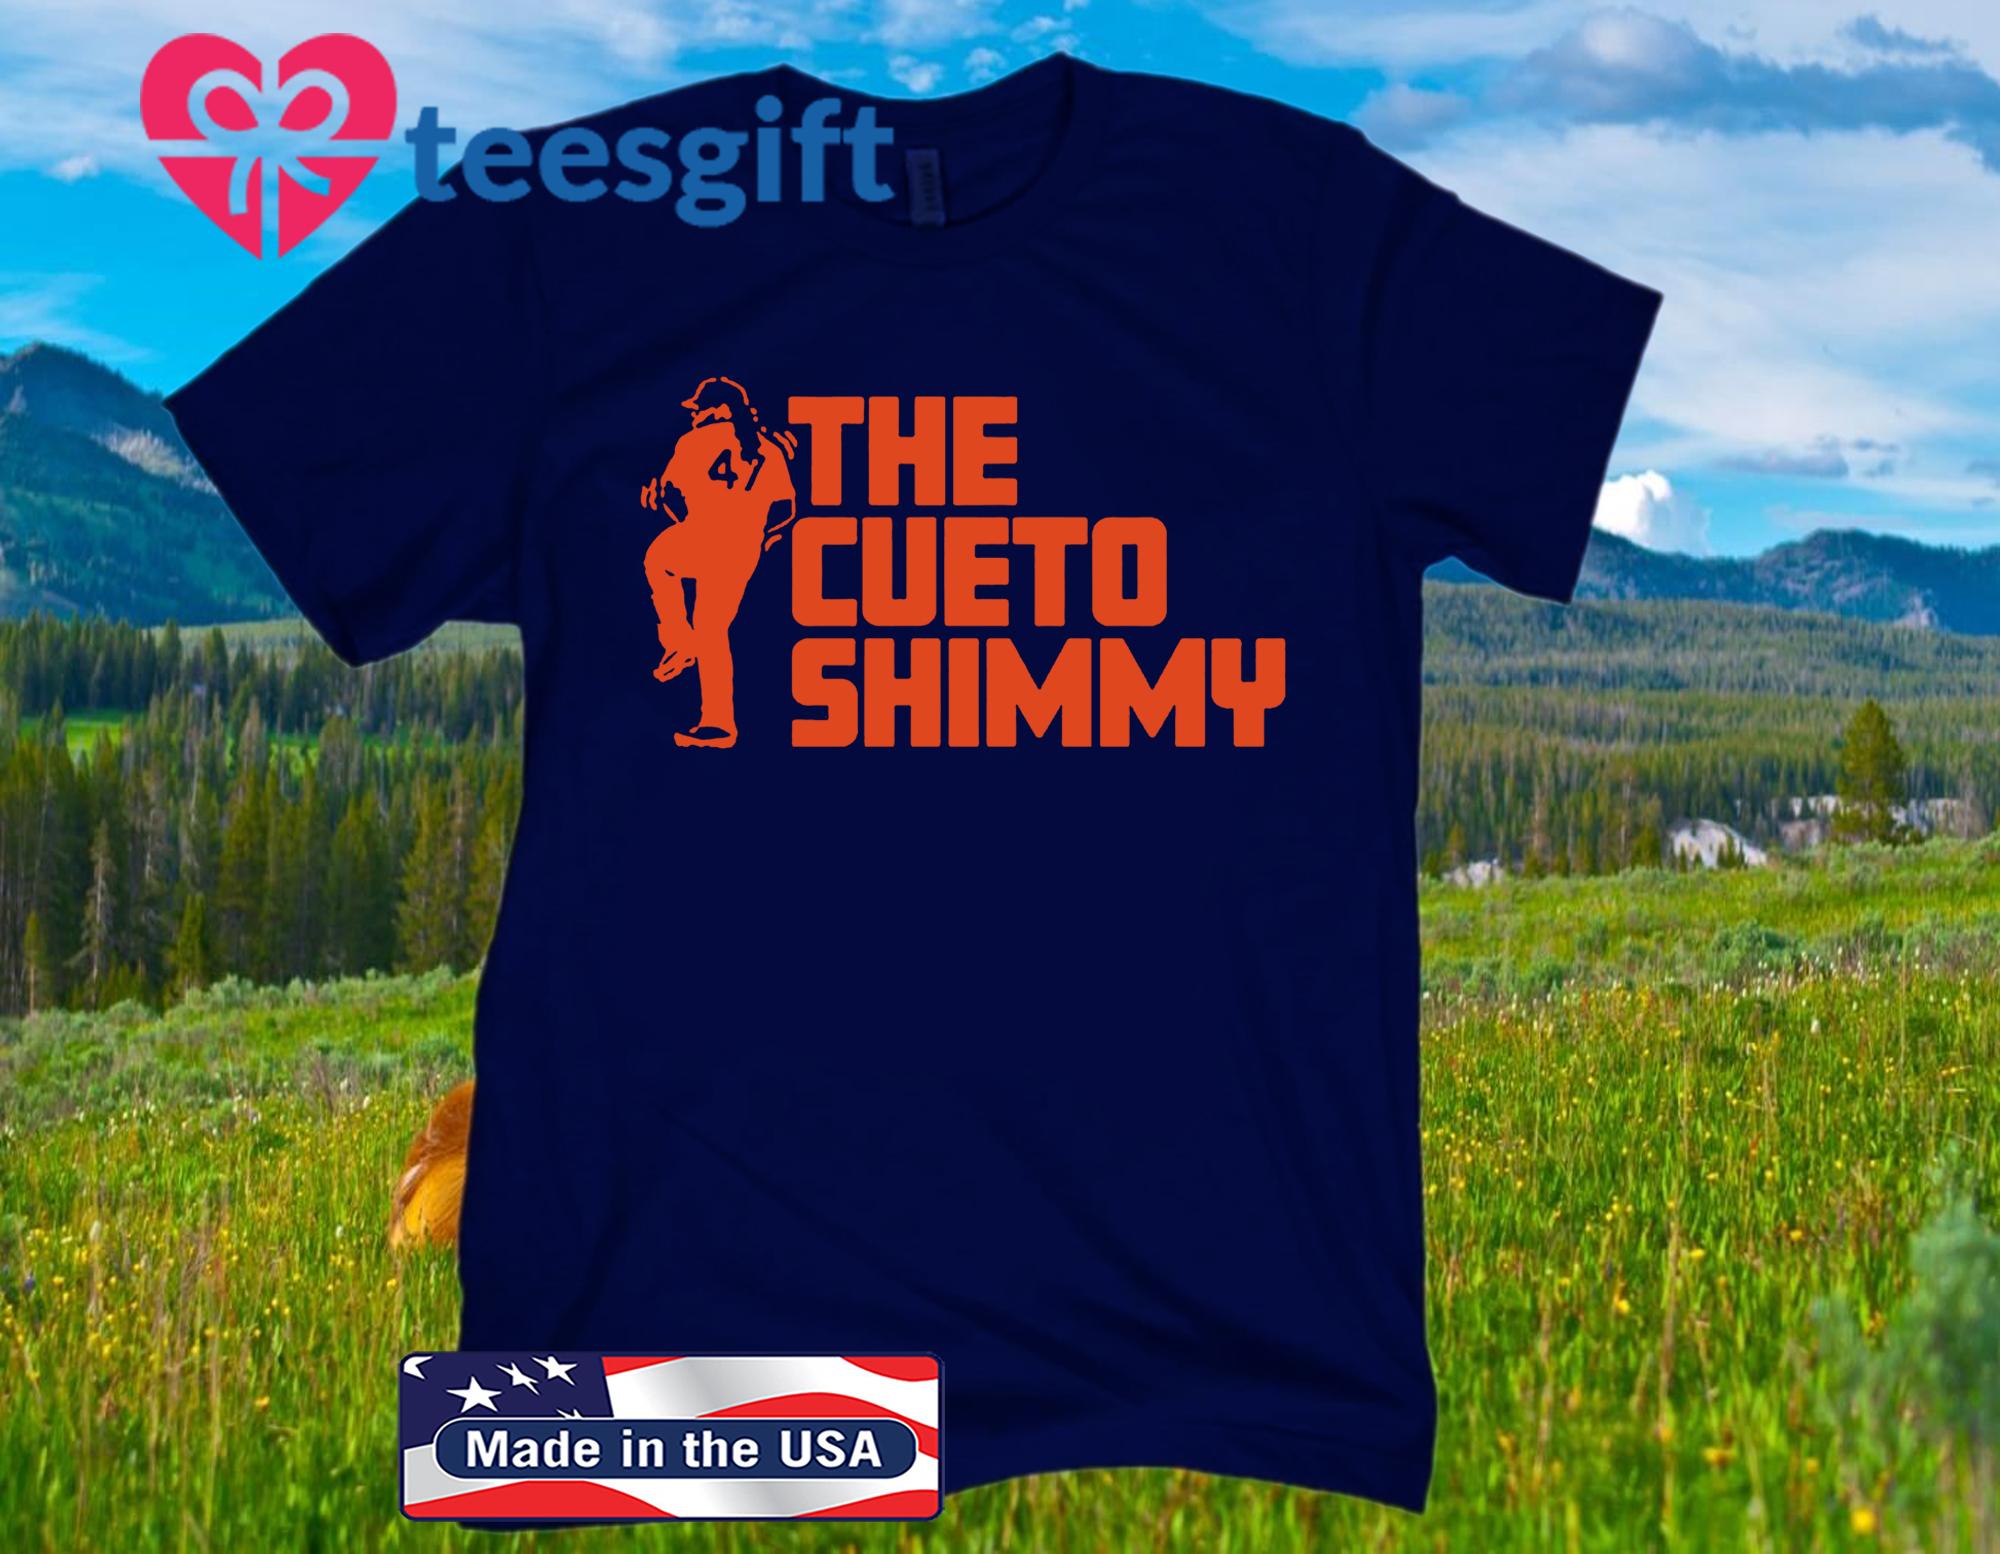 The Cueto Shimmy Official T-Shirt San Francisco - MLBPA Licensed